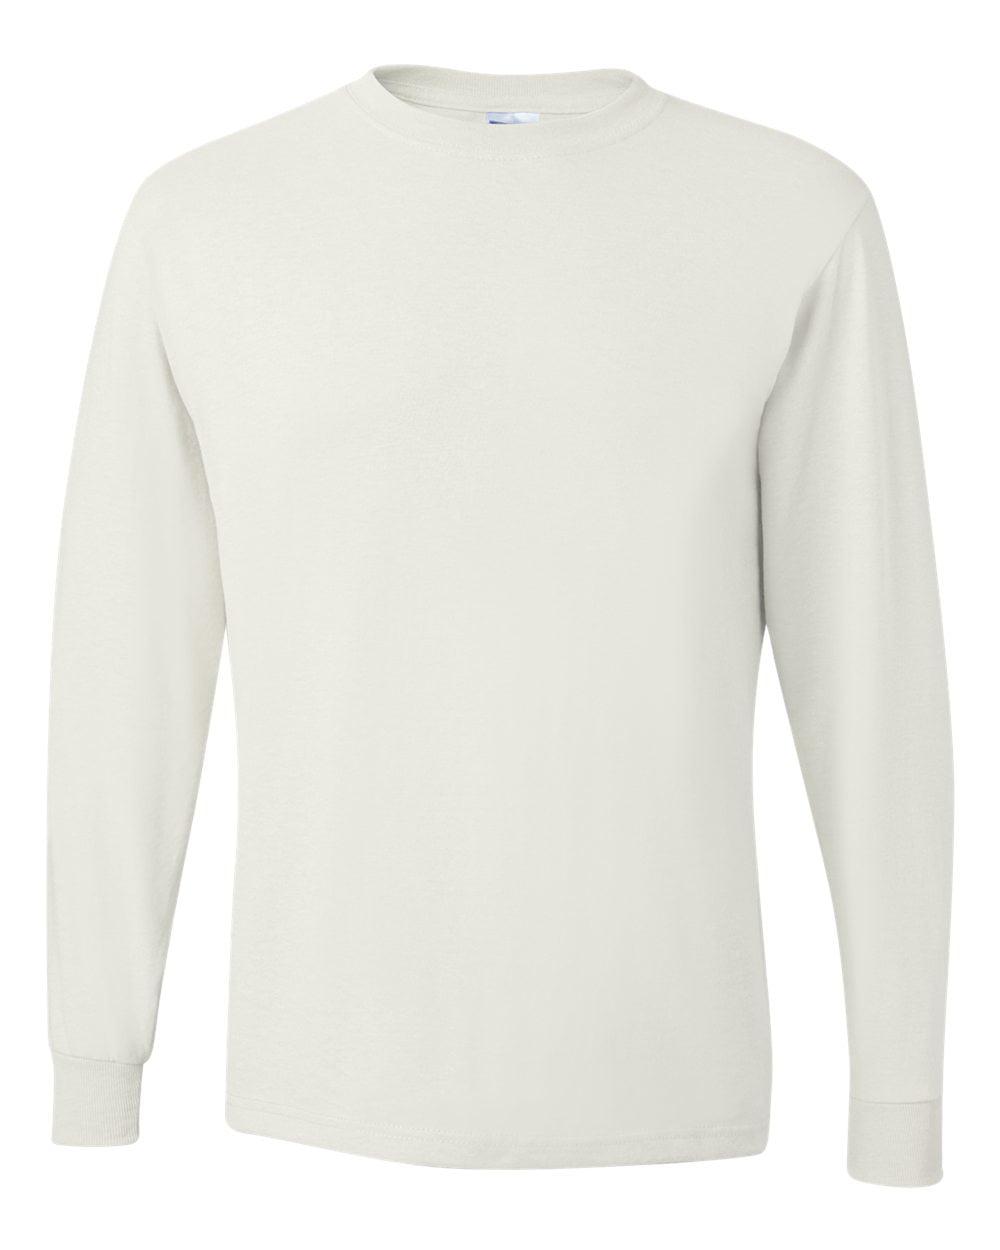 Jerzees Dri-Power Active Long Sleeve 50/50 T-Shirt